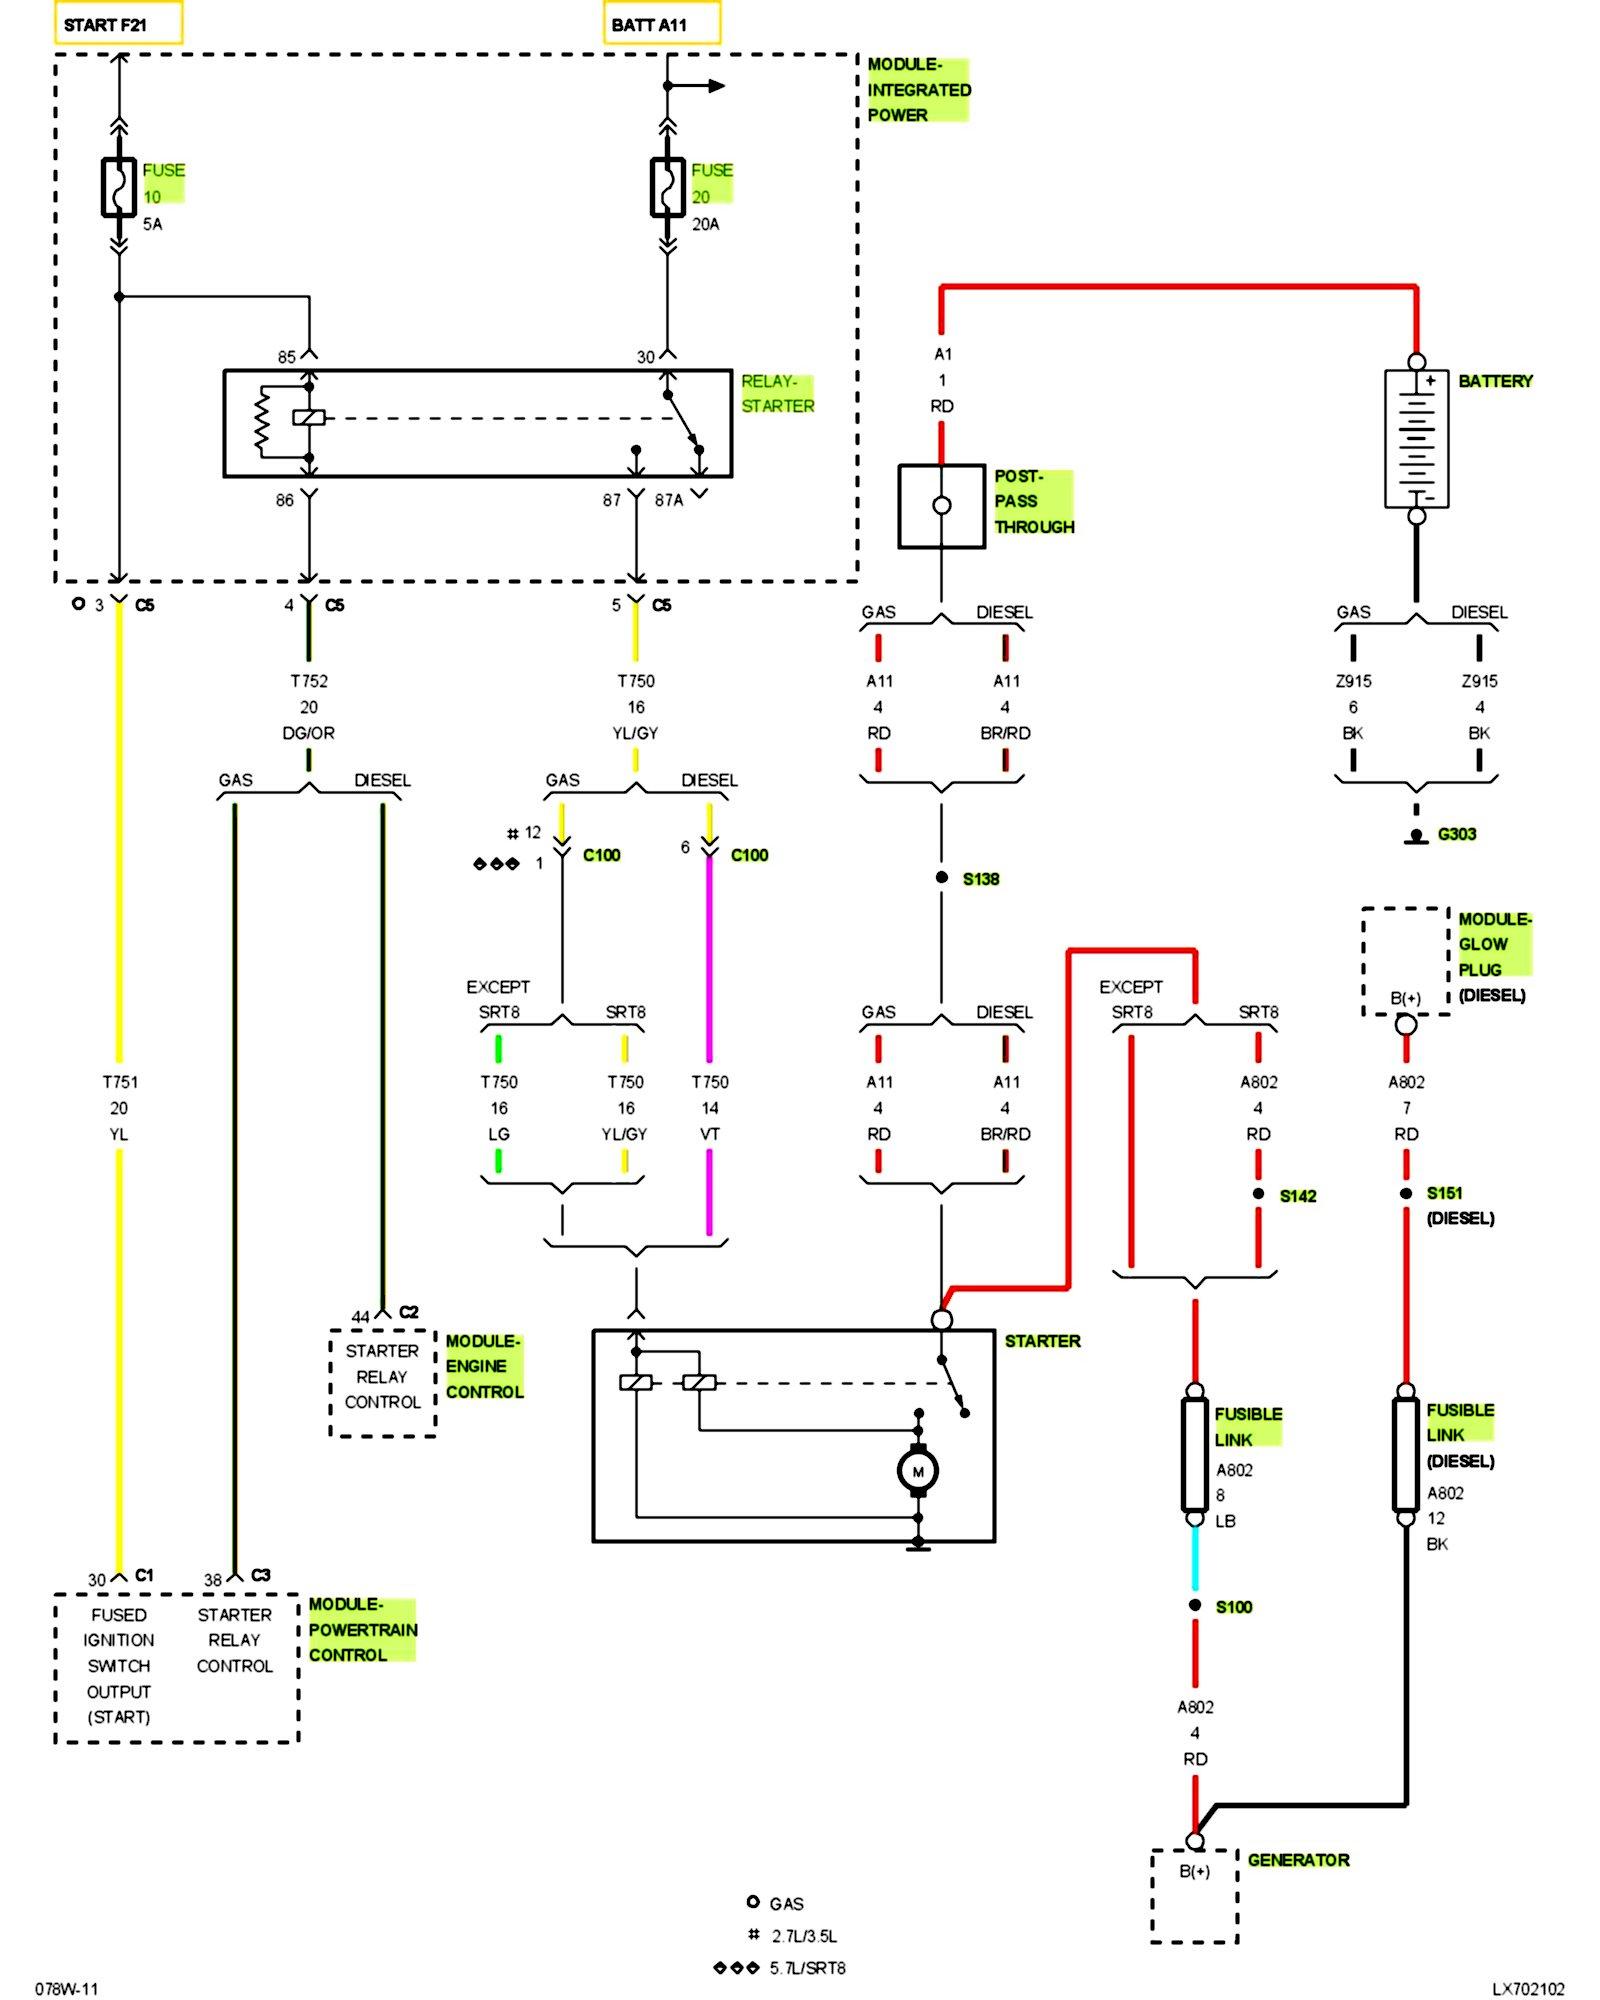 hight resolution of fuse box 2007 pt cruiser wiring diagramwrg 1374 01 pt cruiser fuse diagram